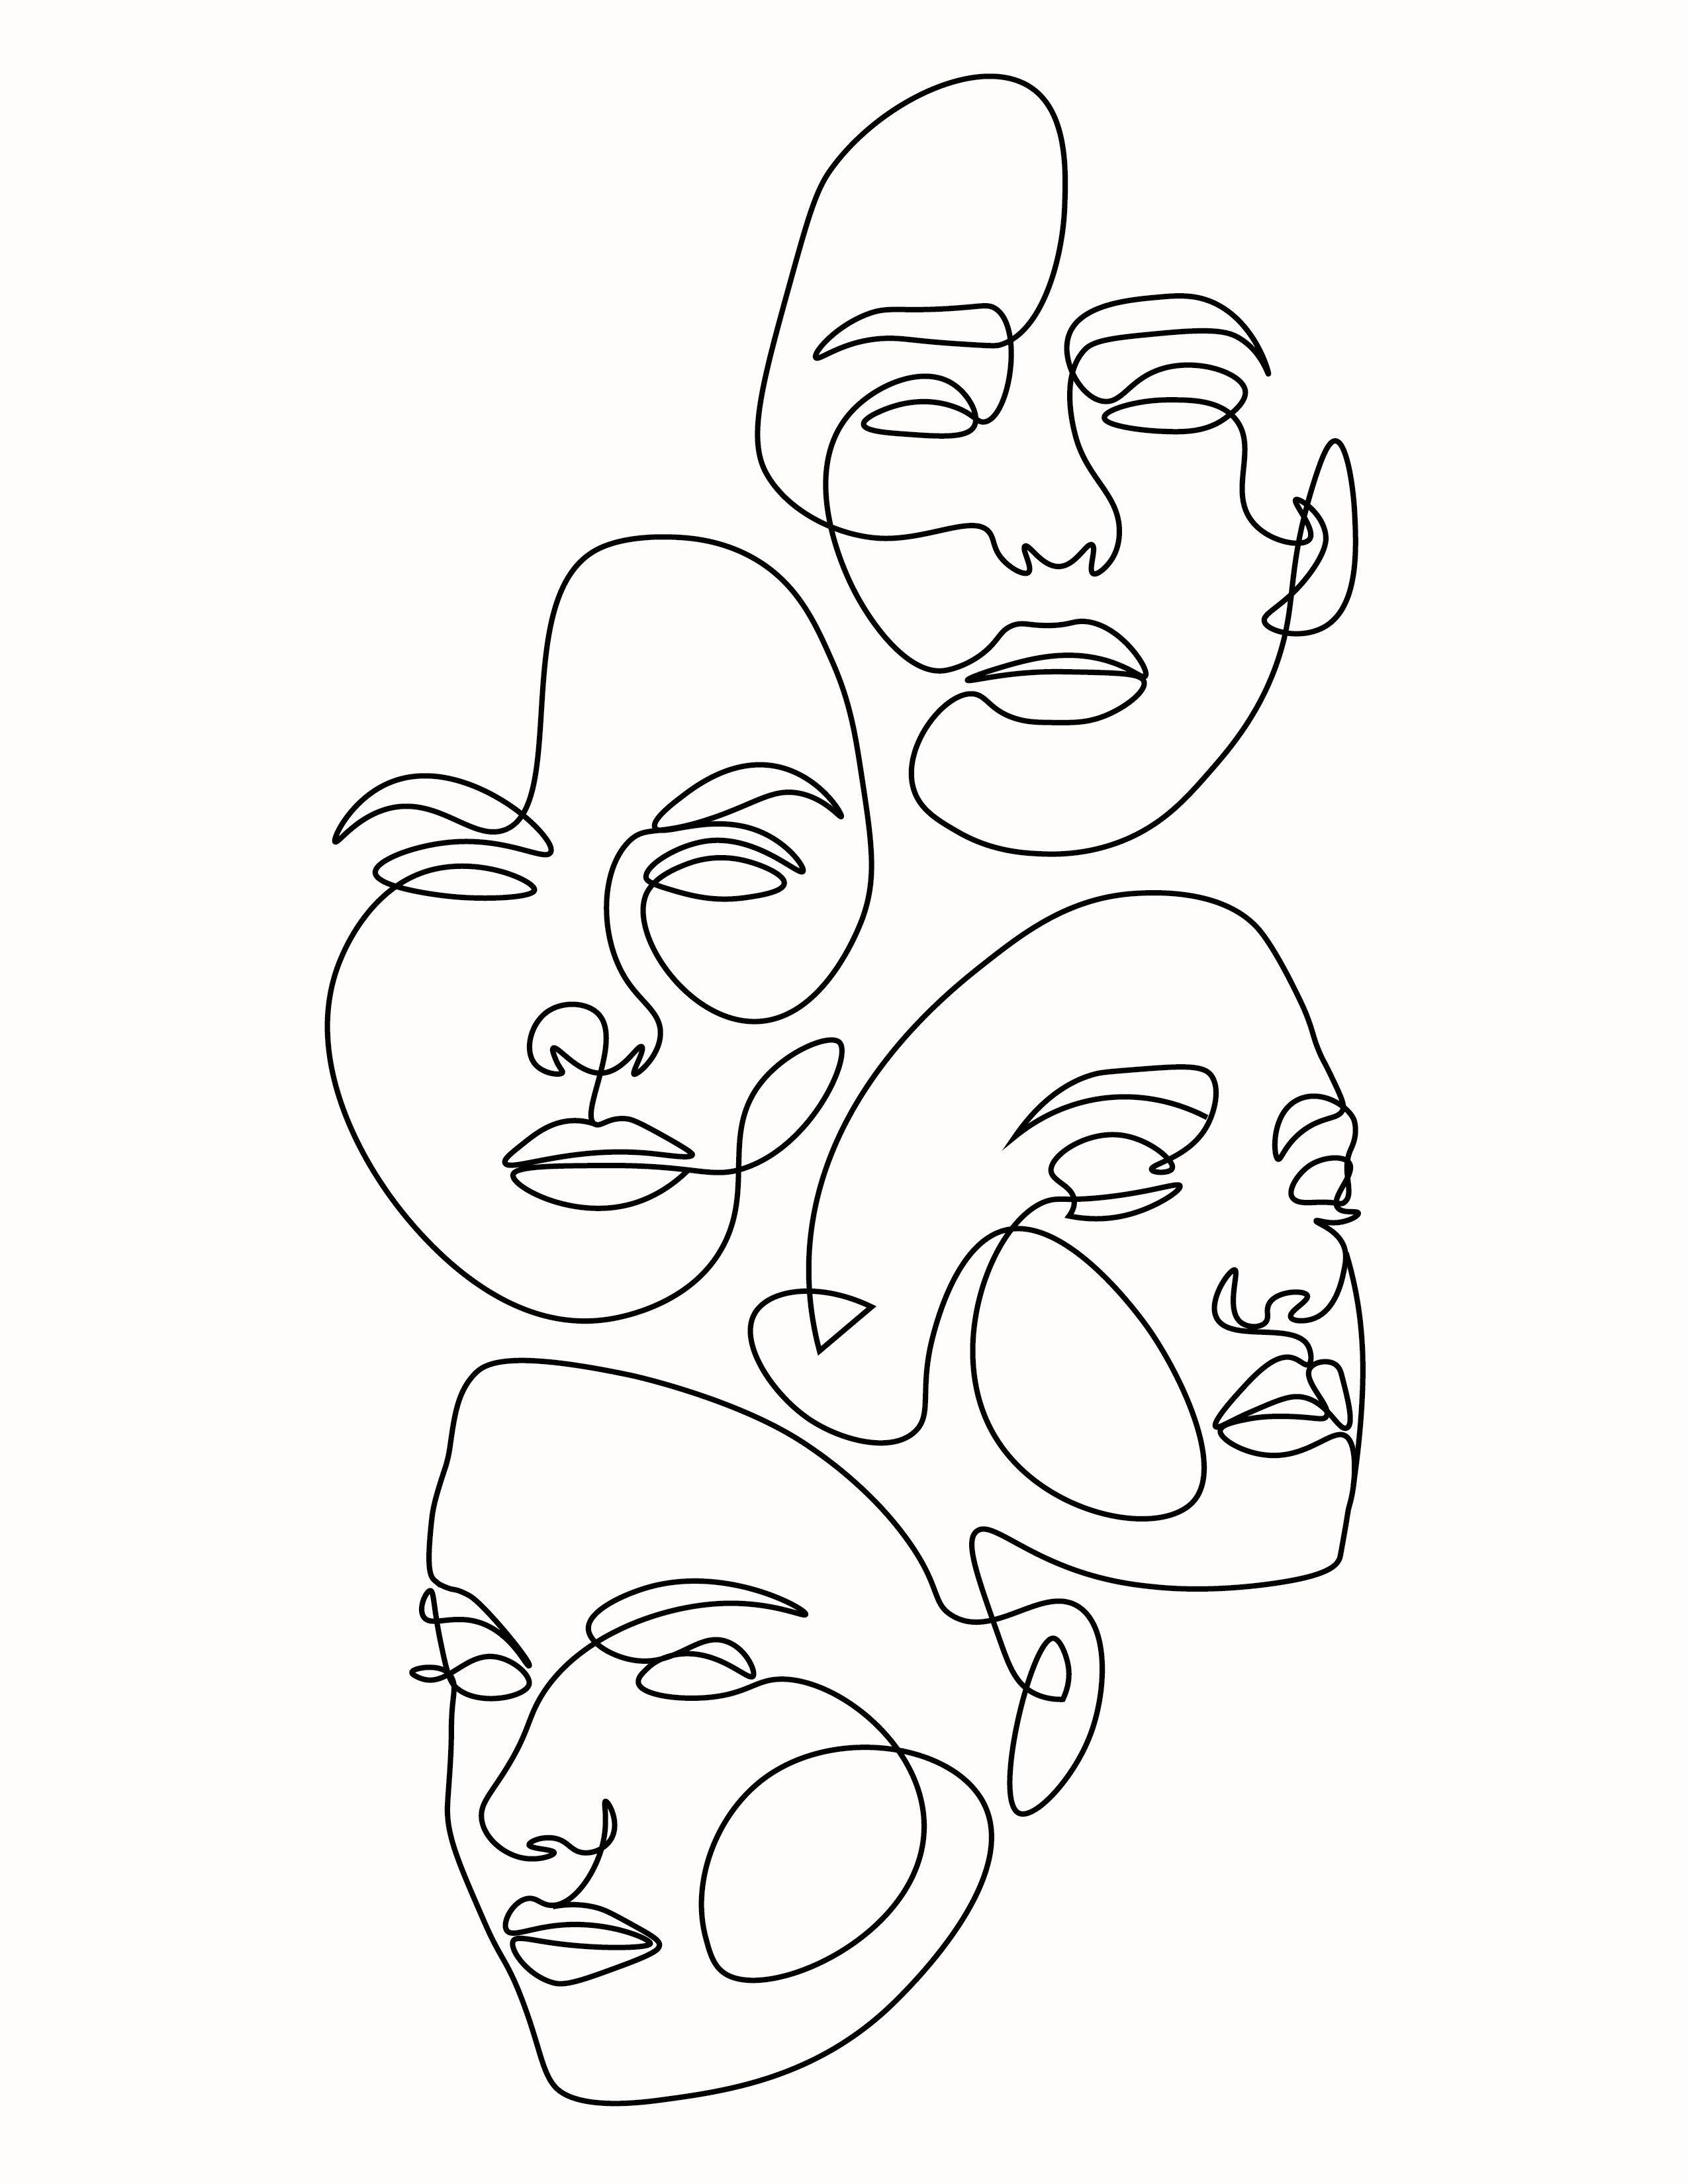 , Multiple Face One Line Art, My Tattoo Blog 2020, My Tattoo Blog 2020